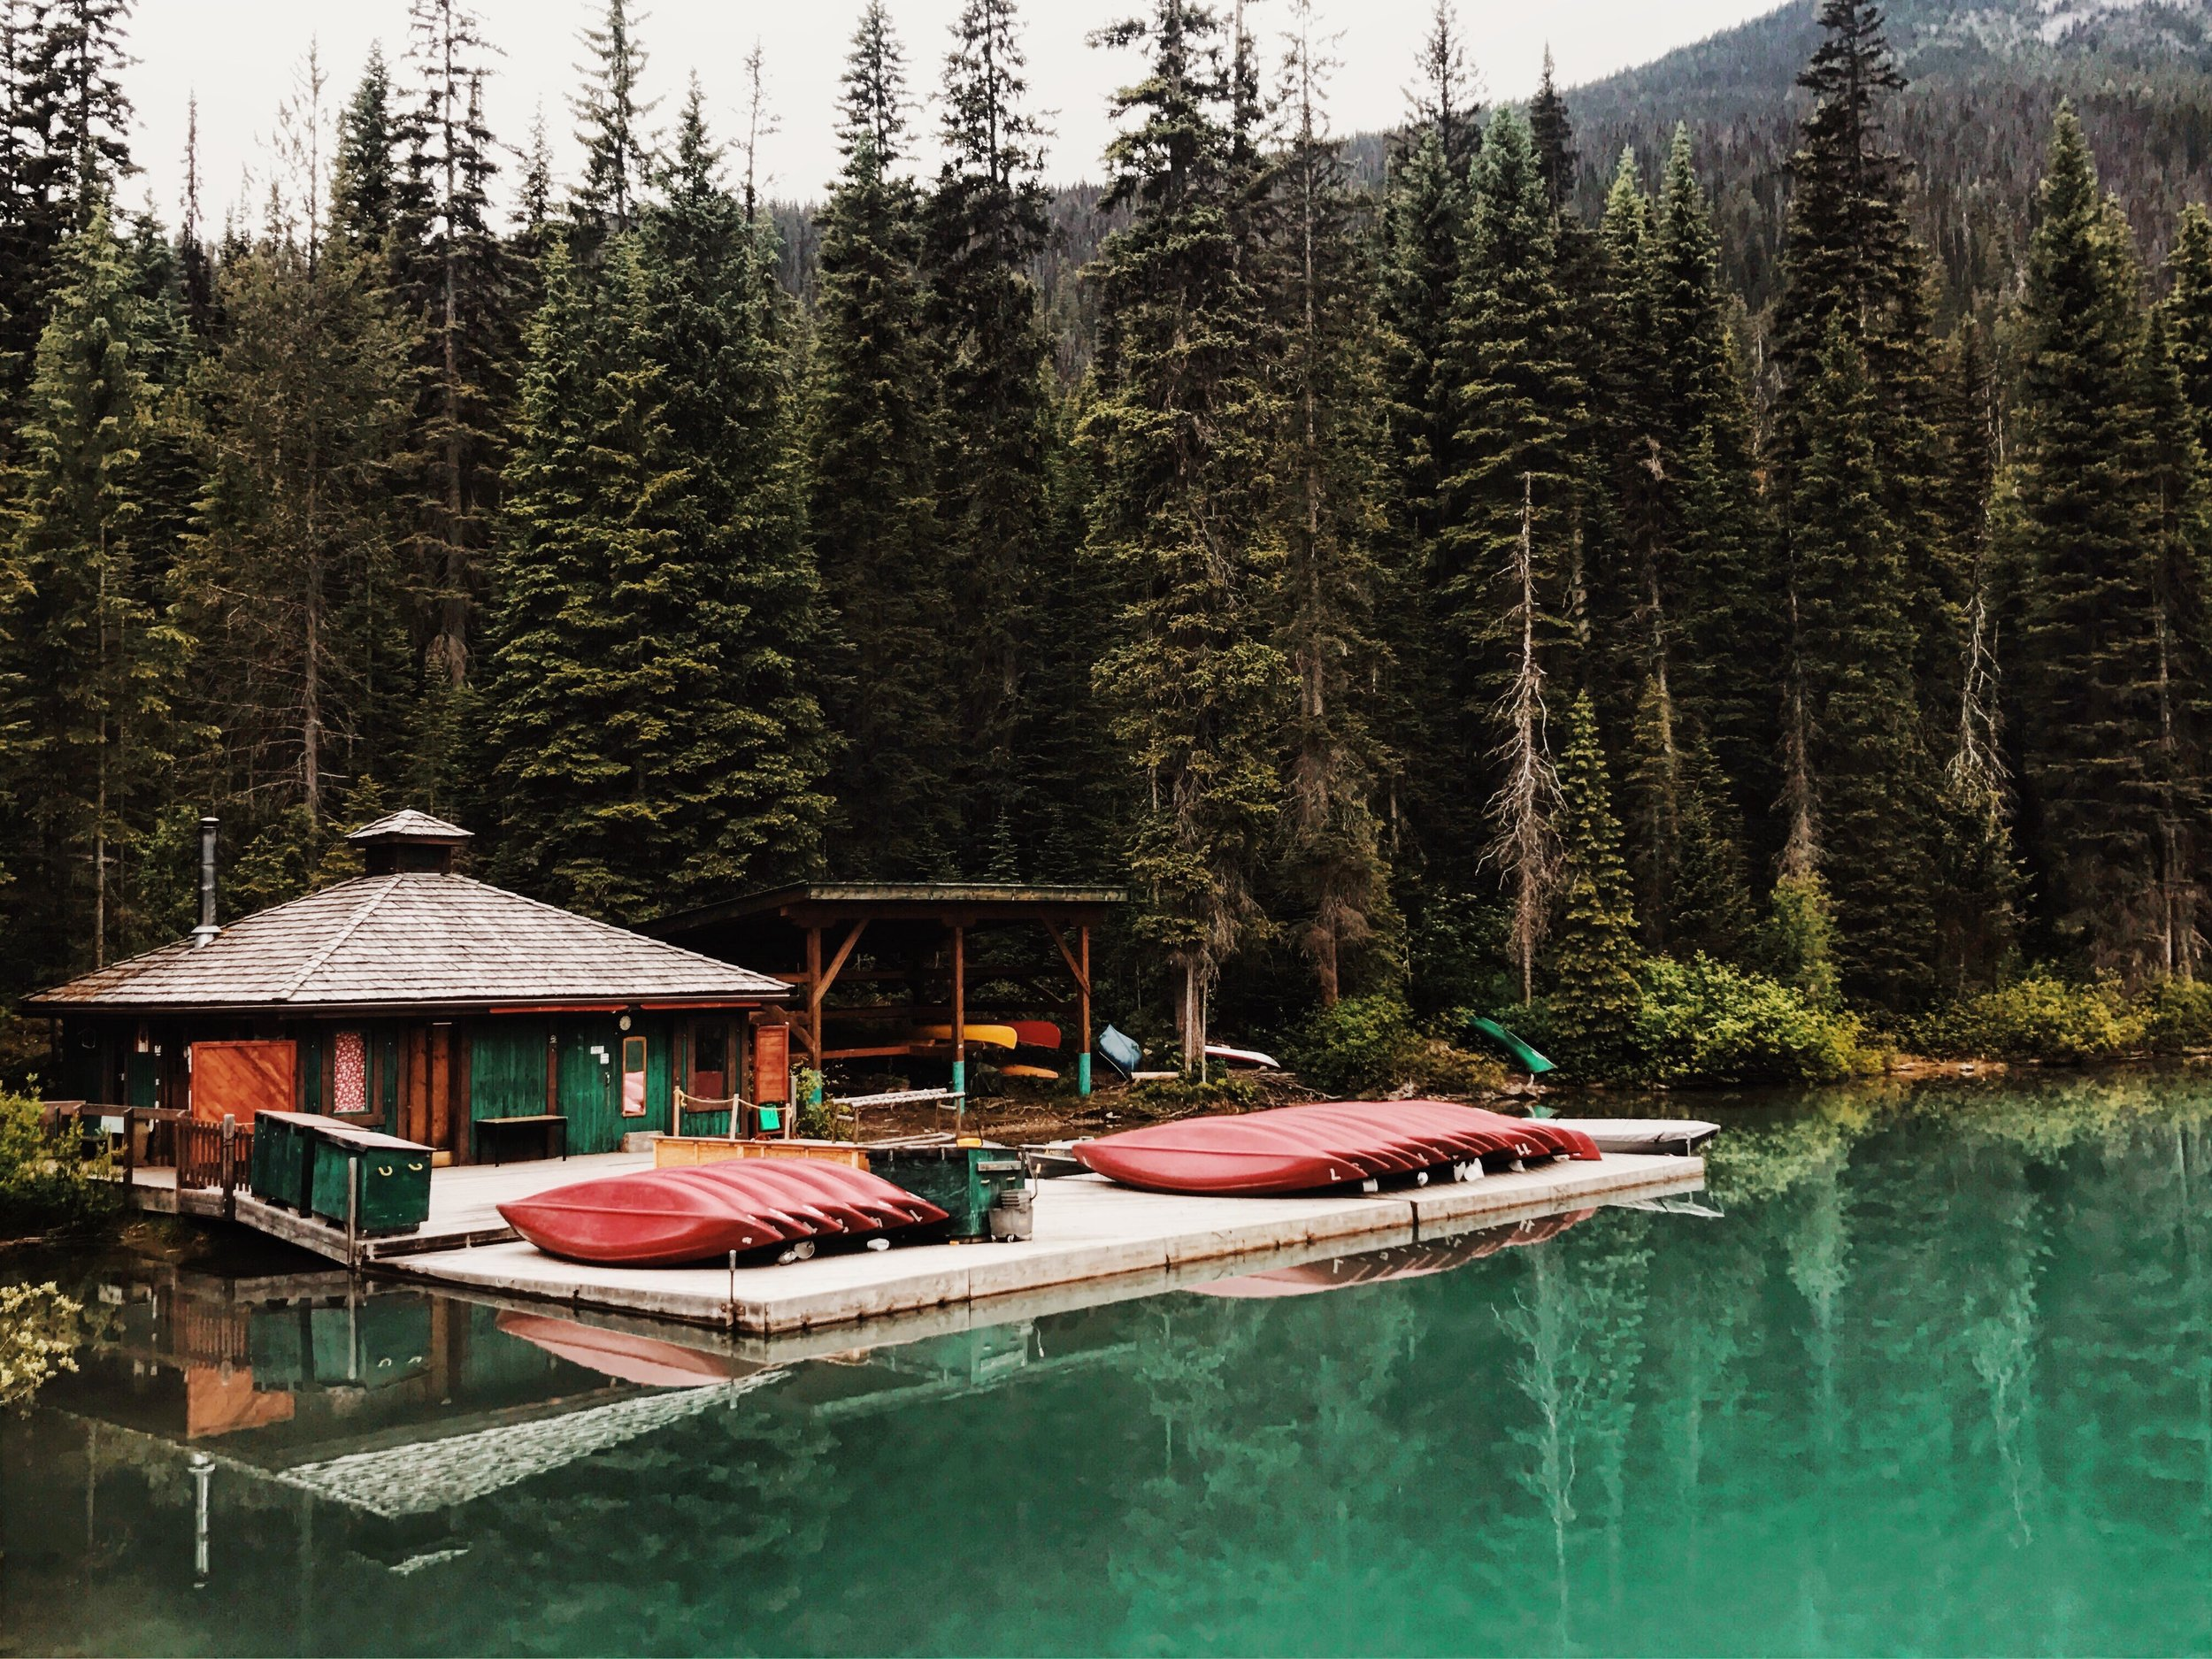 Emerald Lake. Photo by Antrom Kury.